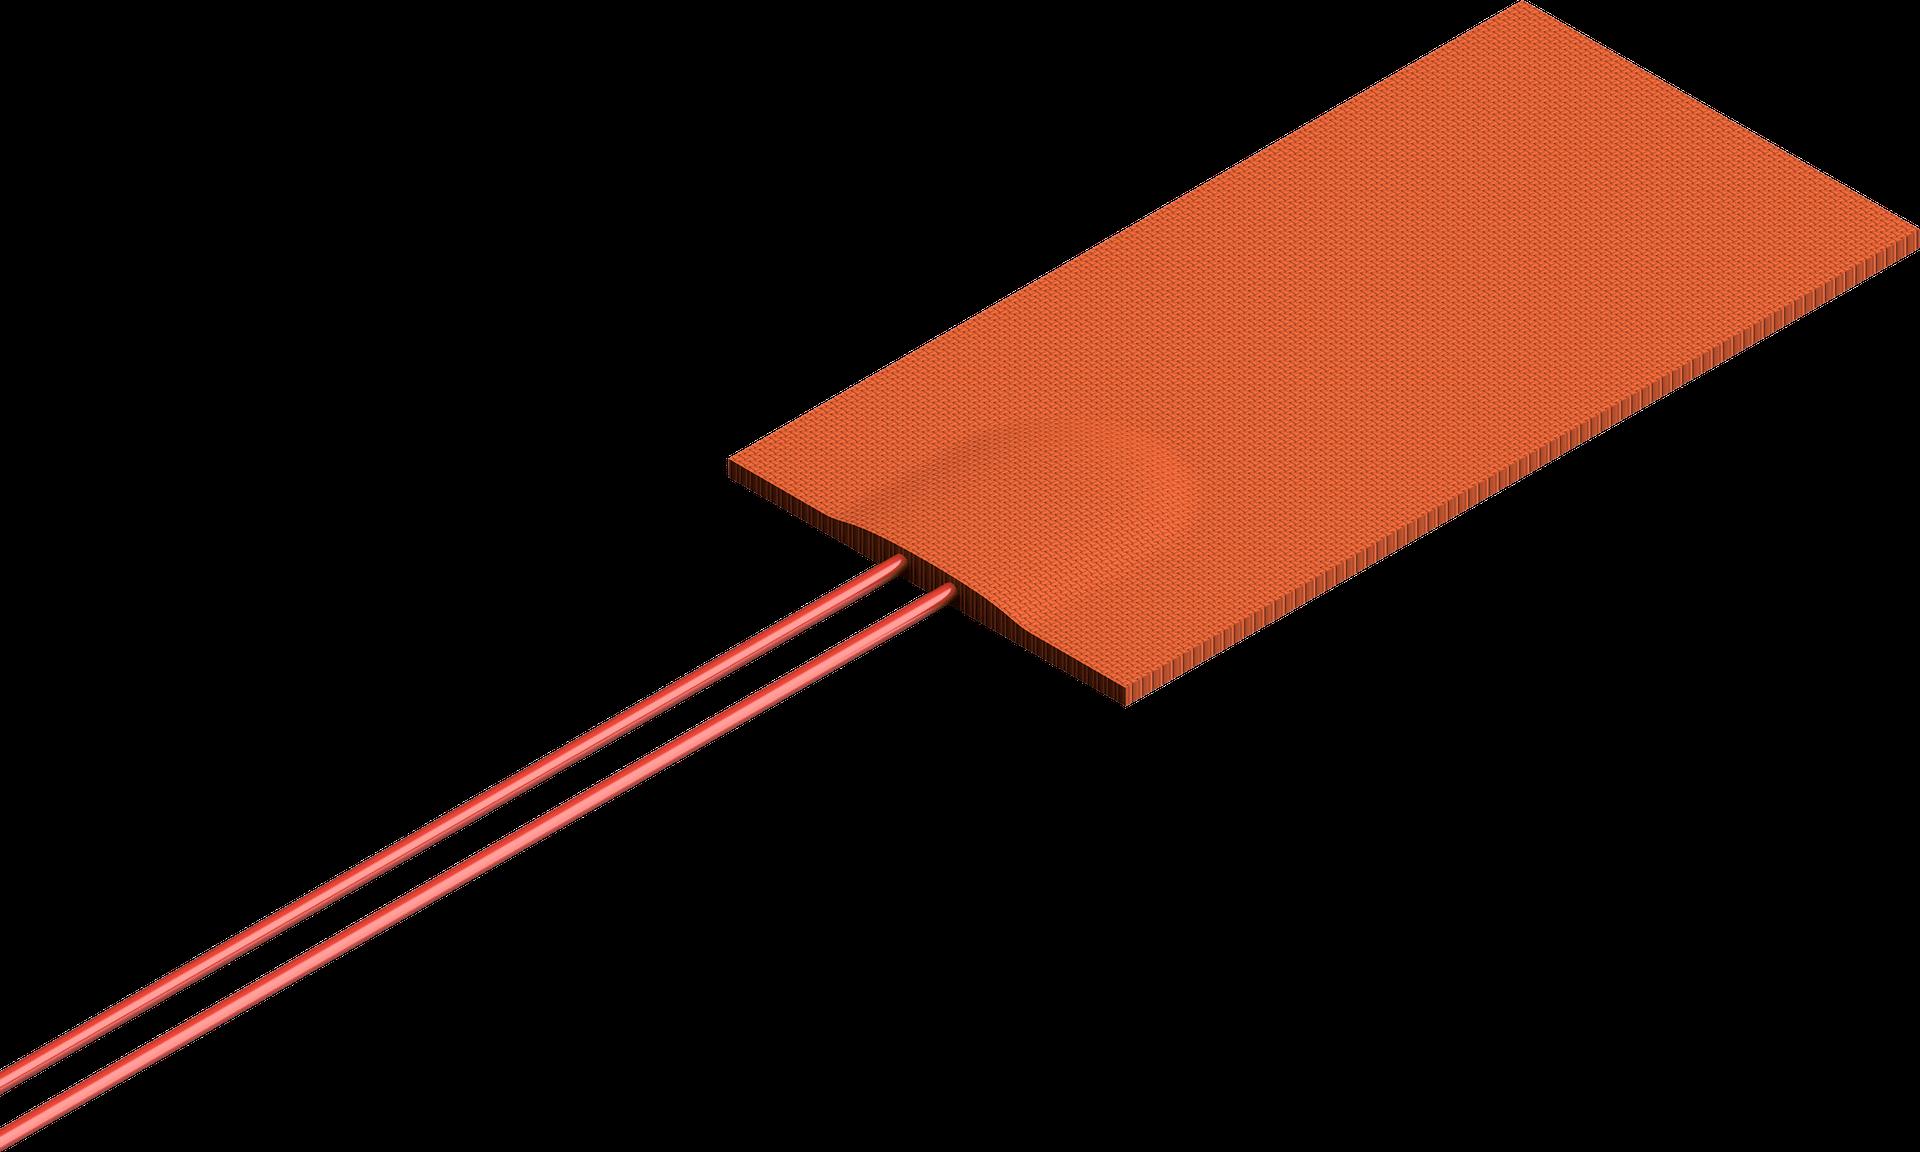 X Stream Designs - X-20WH - 20 Watt Silicone Rubber Heating Element